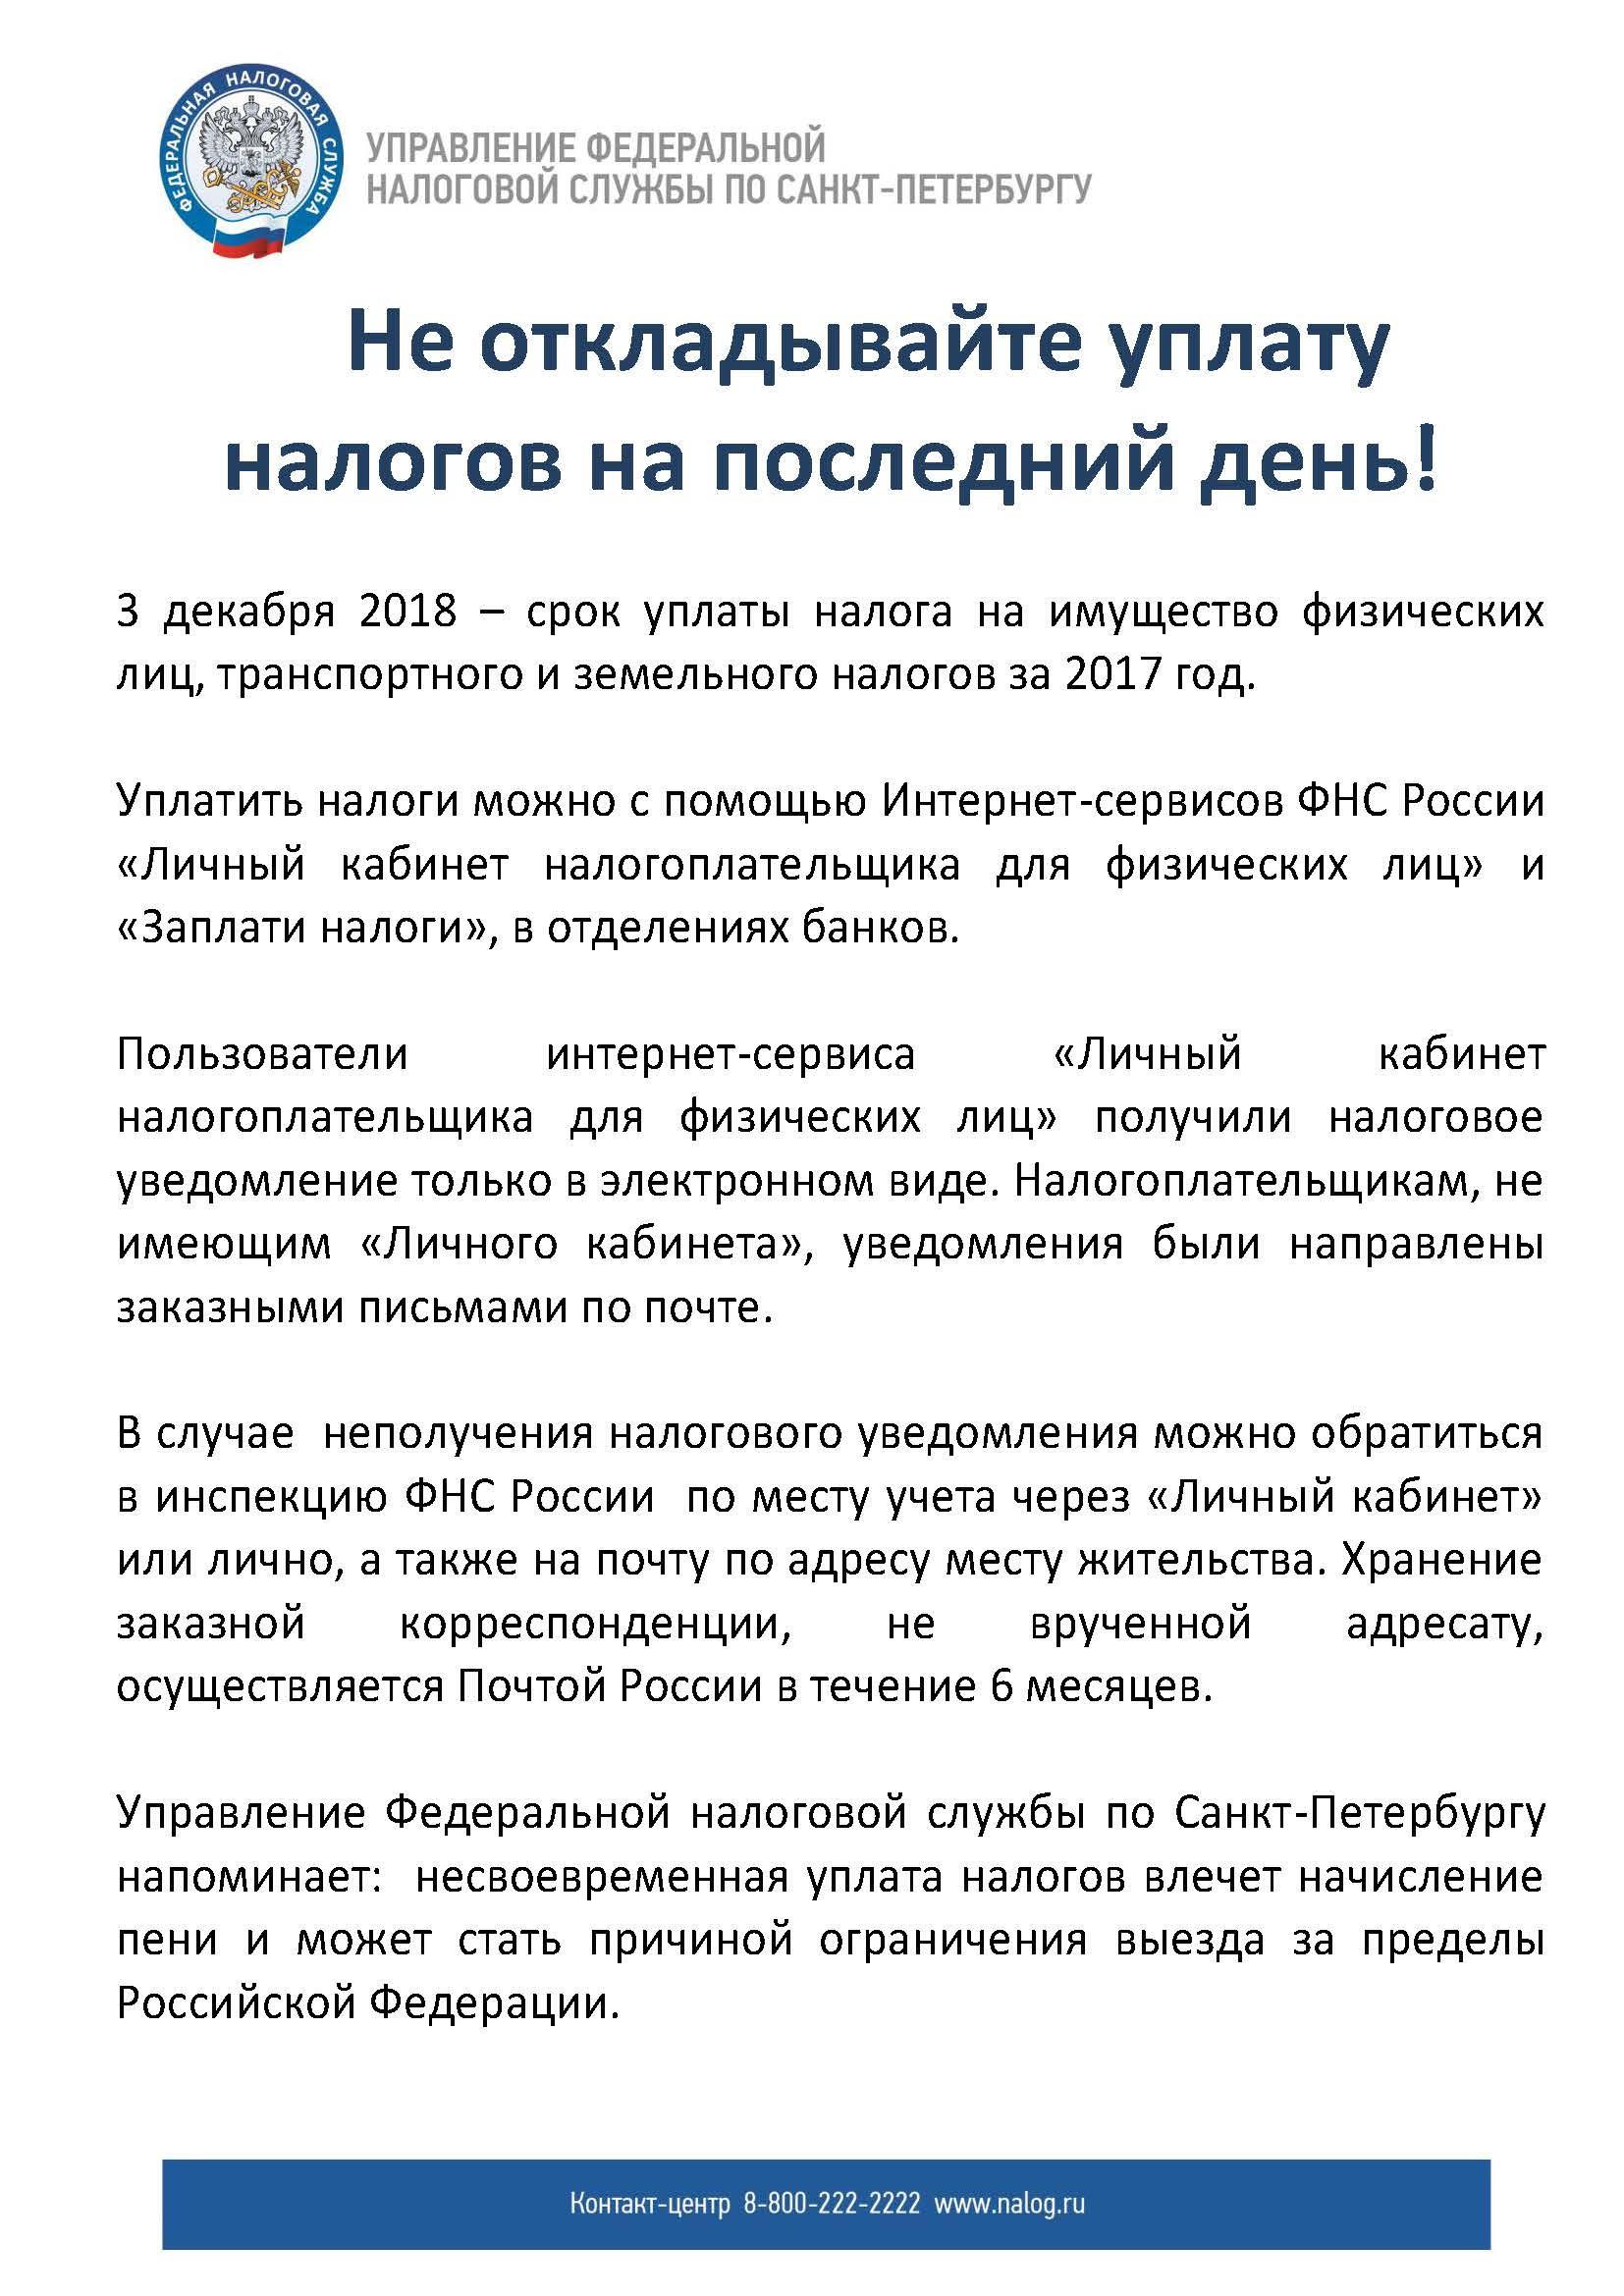 imushhestvo_2018_tks.jpg